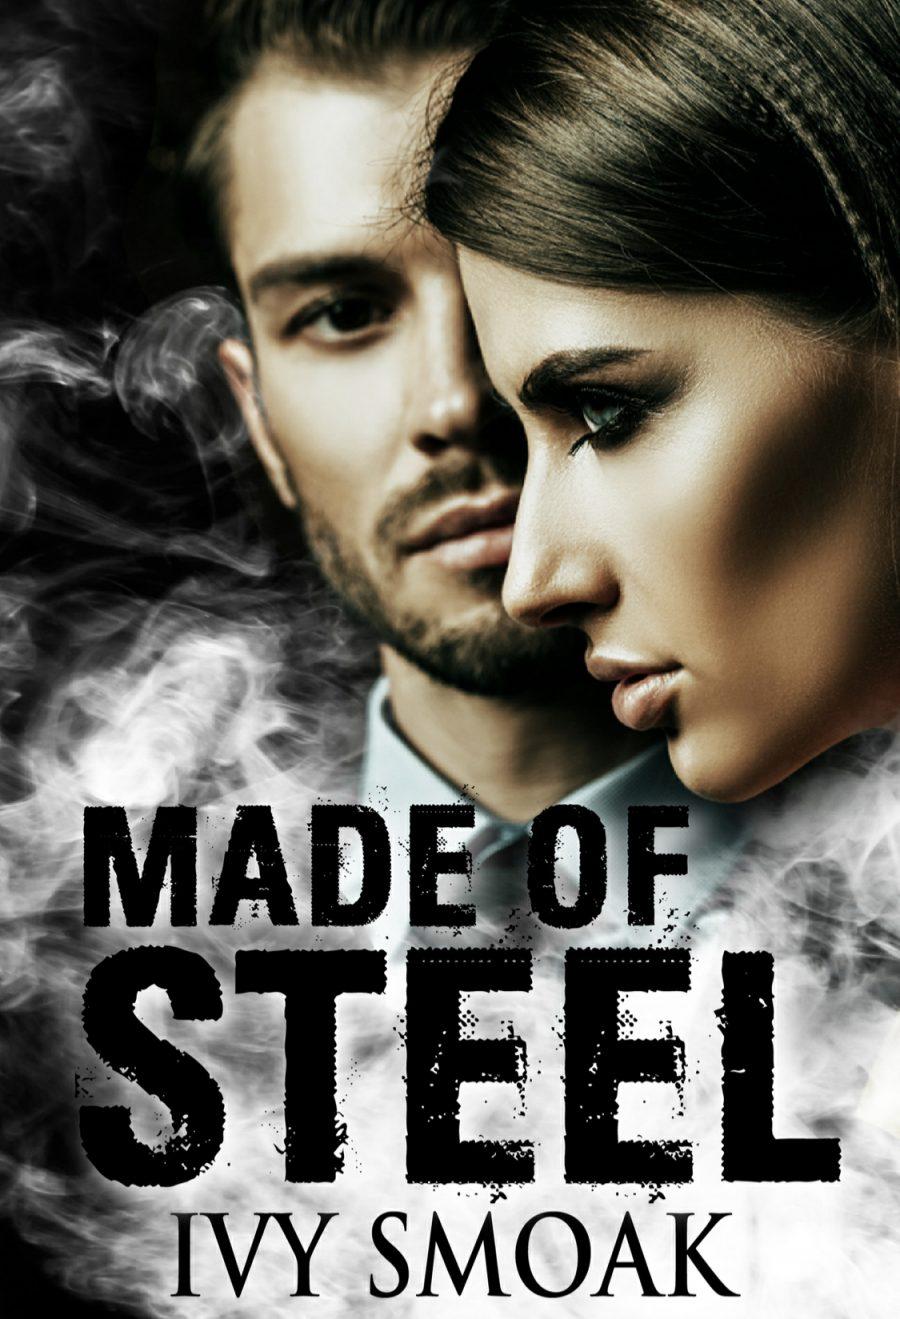 Made of Steel by Ivy Smoak - A Book Review #BookReview #4Stars #OlderSeries #SeriesComplete #SuperHero #Vigilante #KindleUnlimited #KU